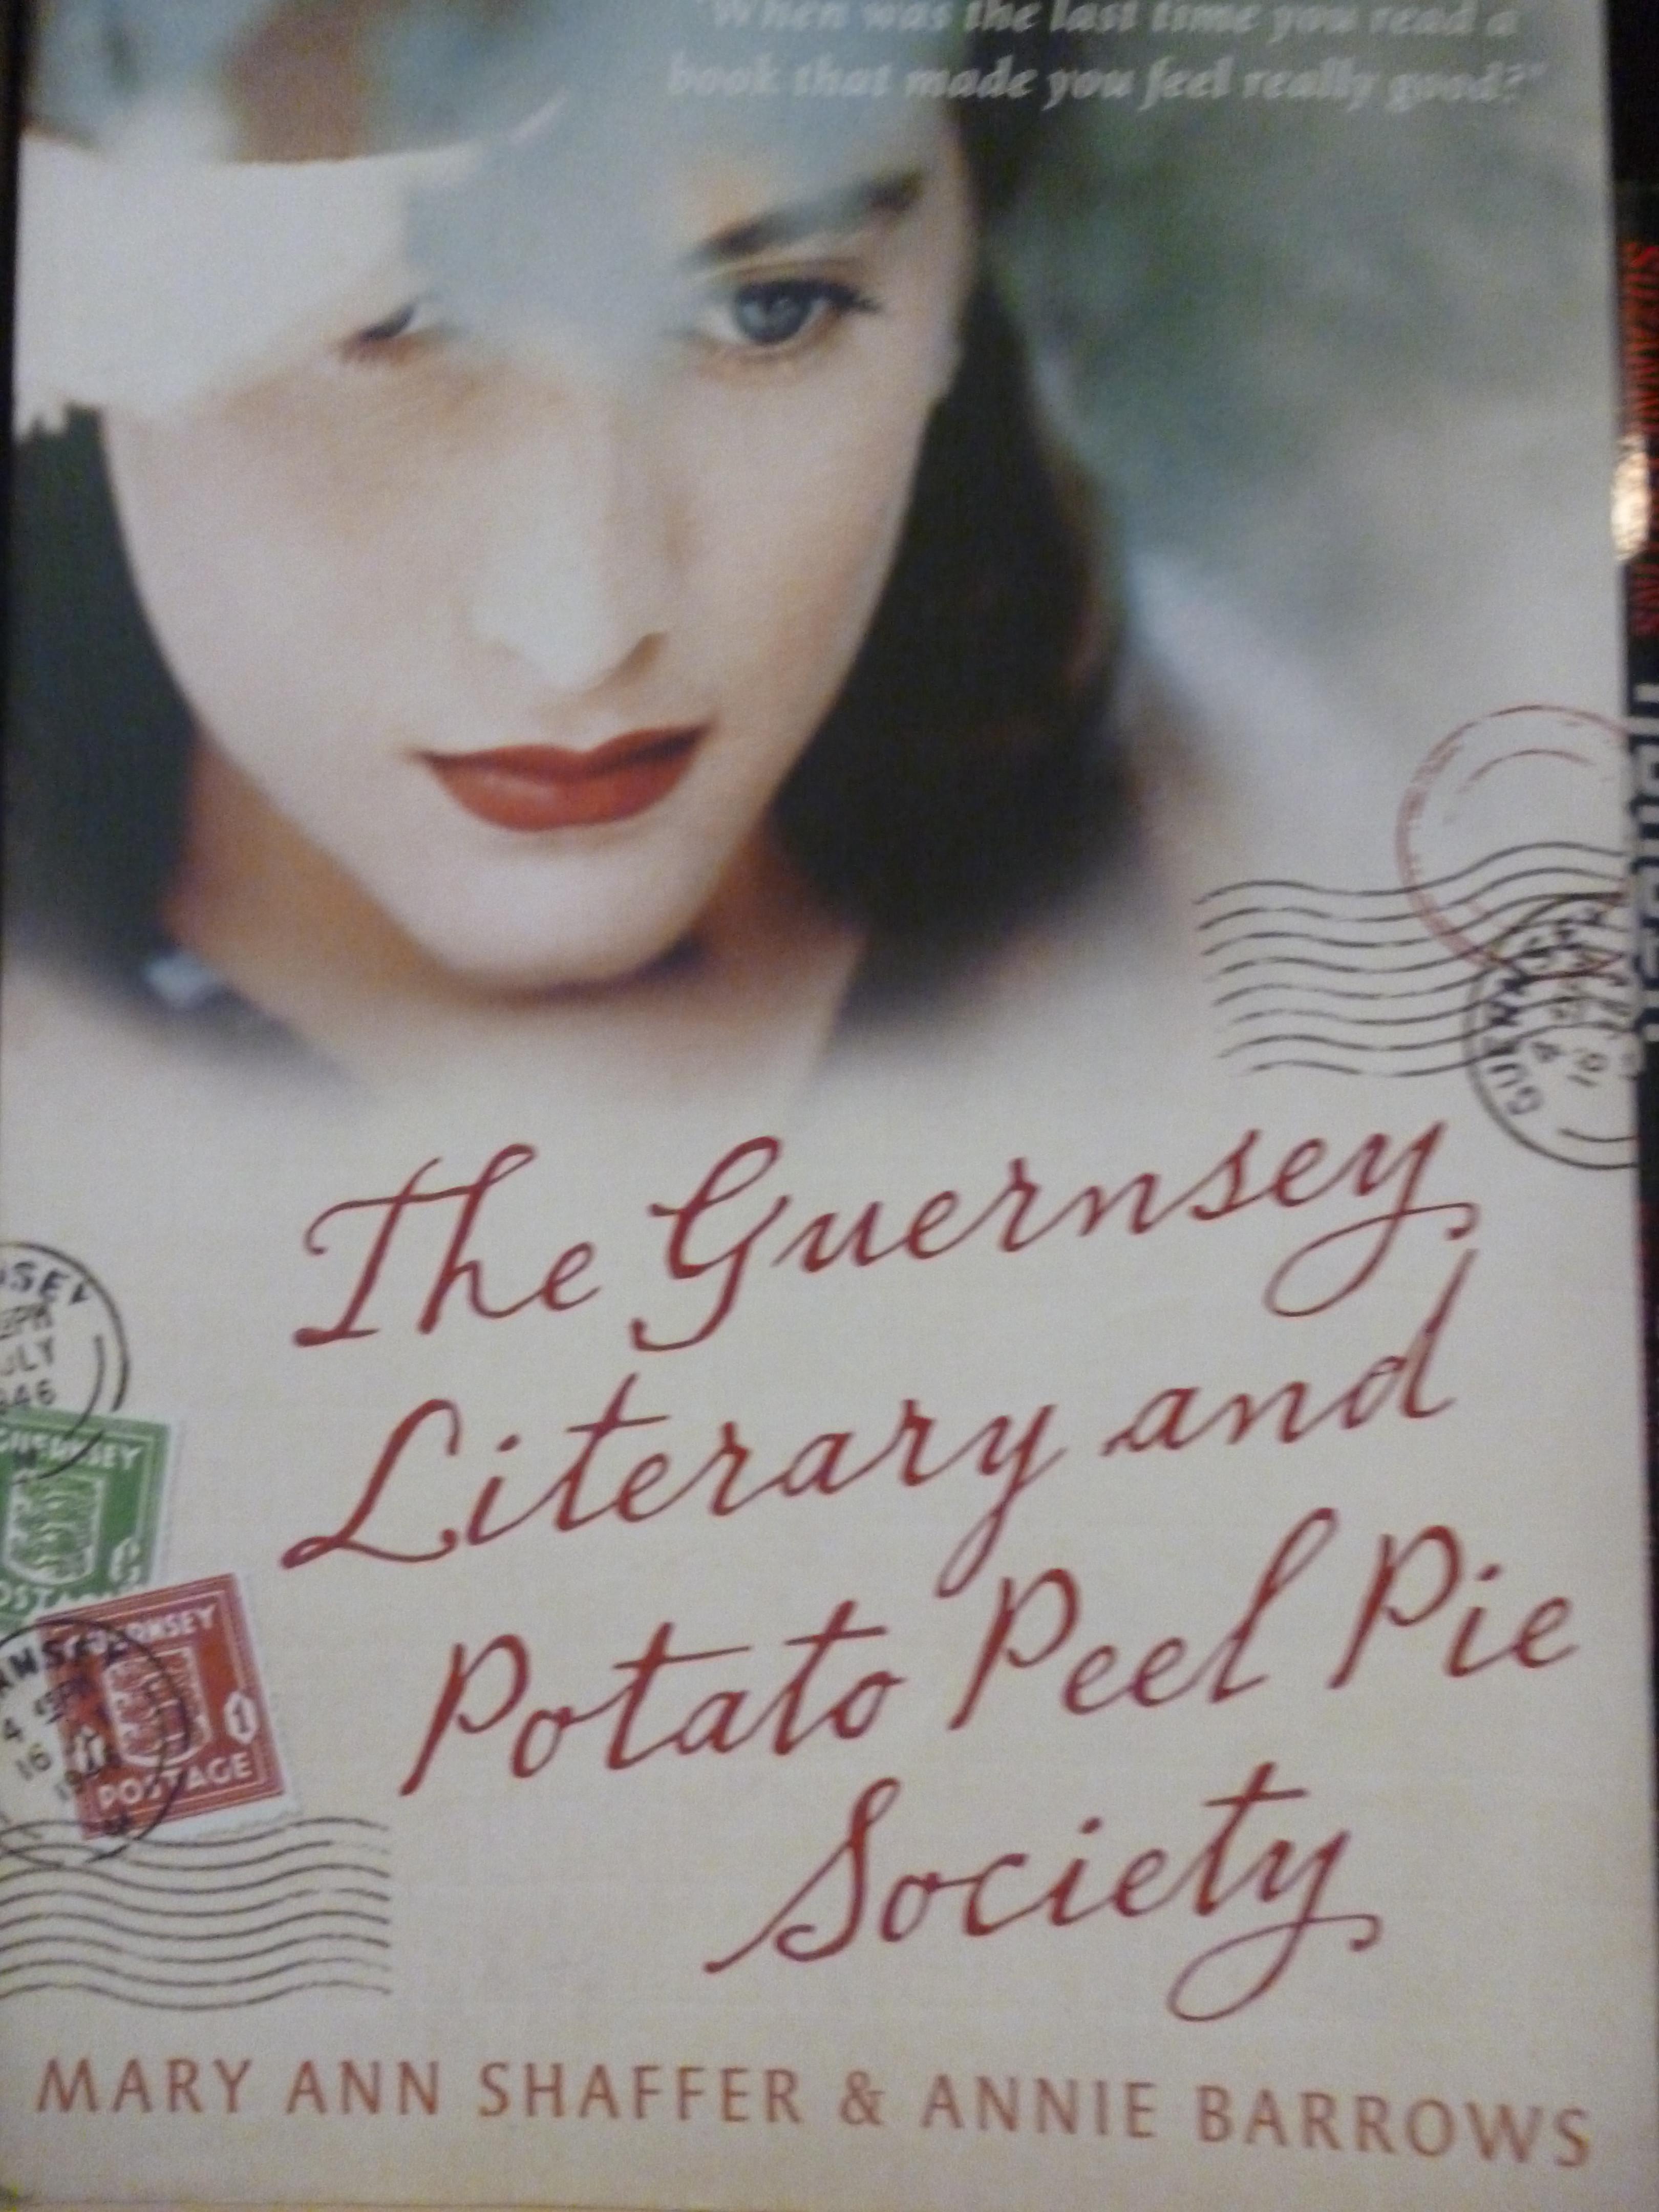 Potato Peel Pie Society  The Guernsey Literary and Potato Peel Pie Society by